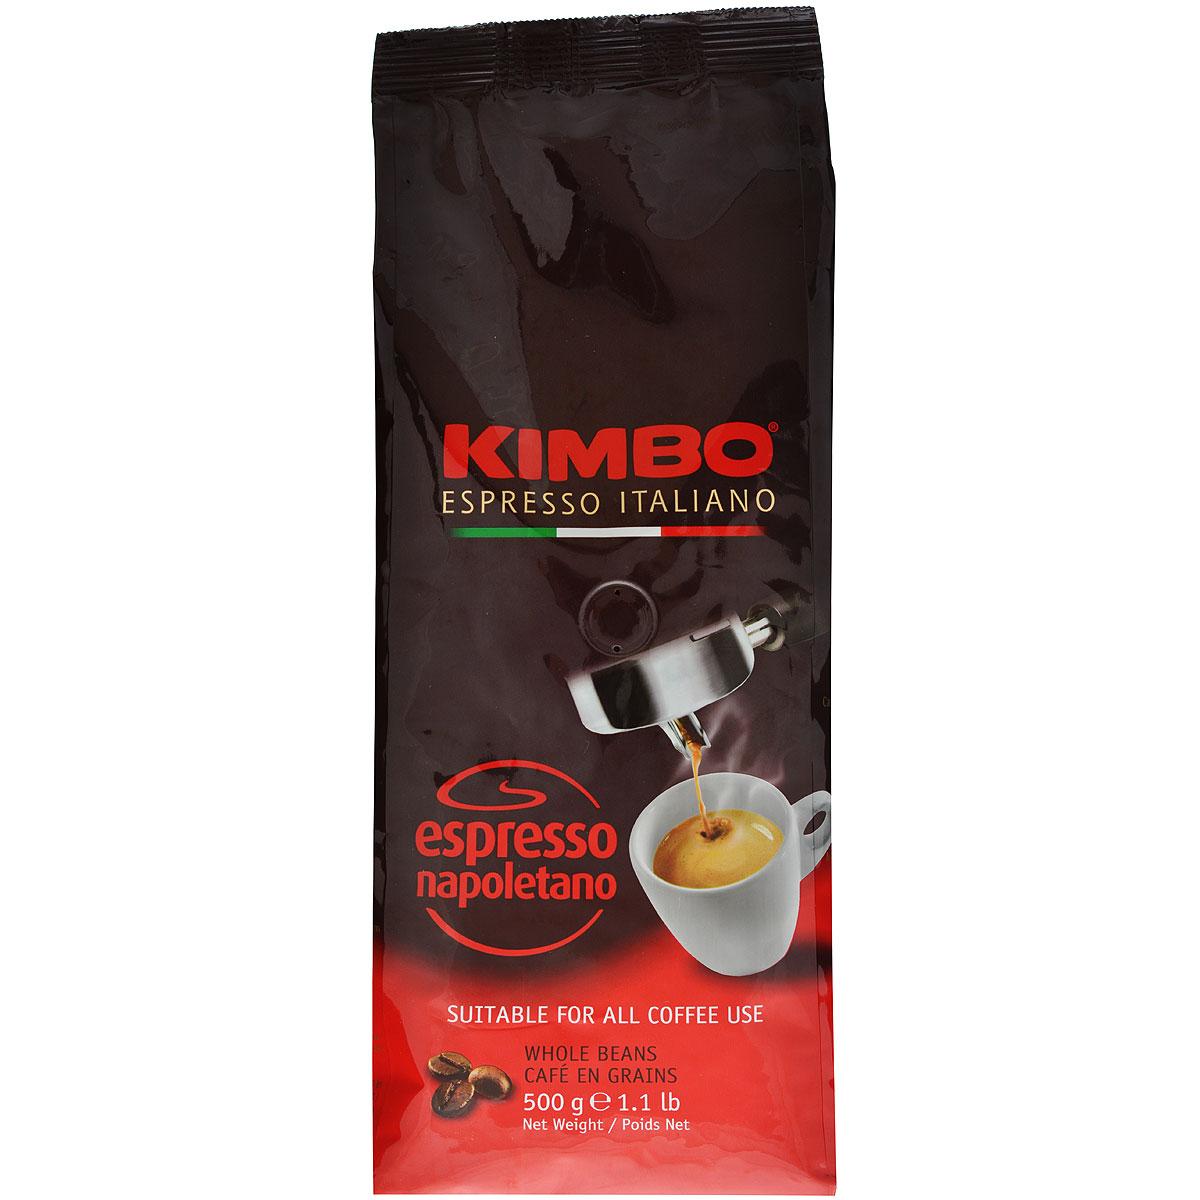 Kimbo Espresso Napoletano кофе в зернах, 500 г 8002200602130